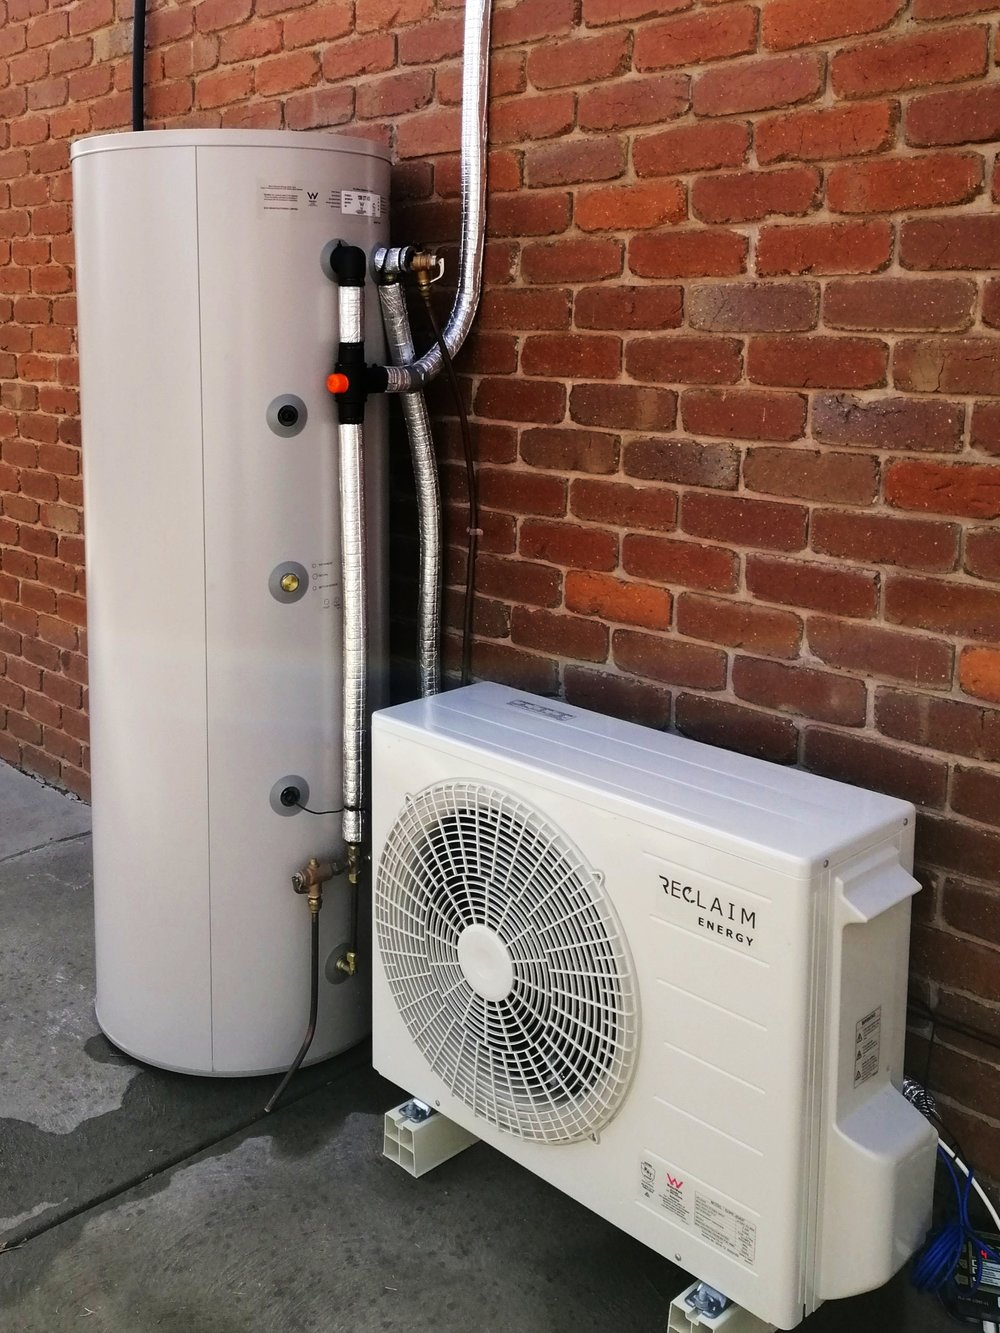 Reclaim Energy heat pump installed